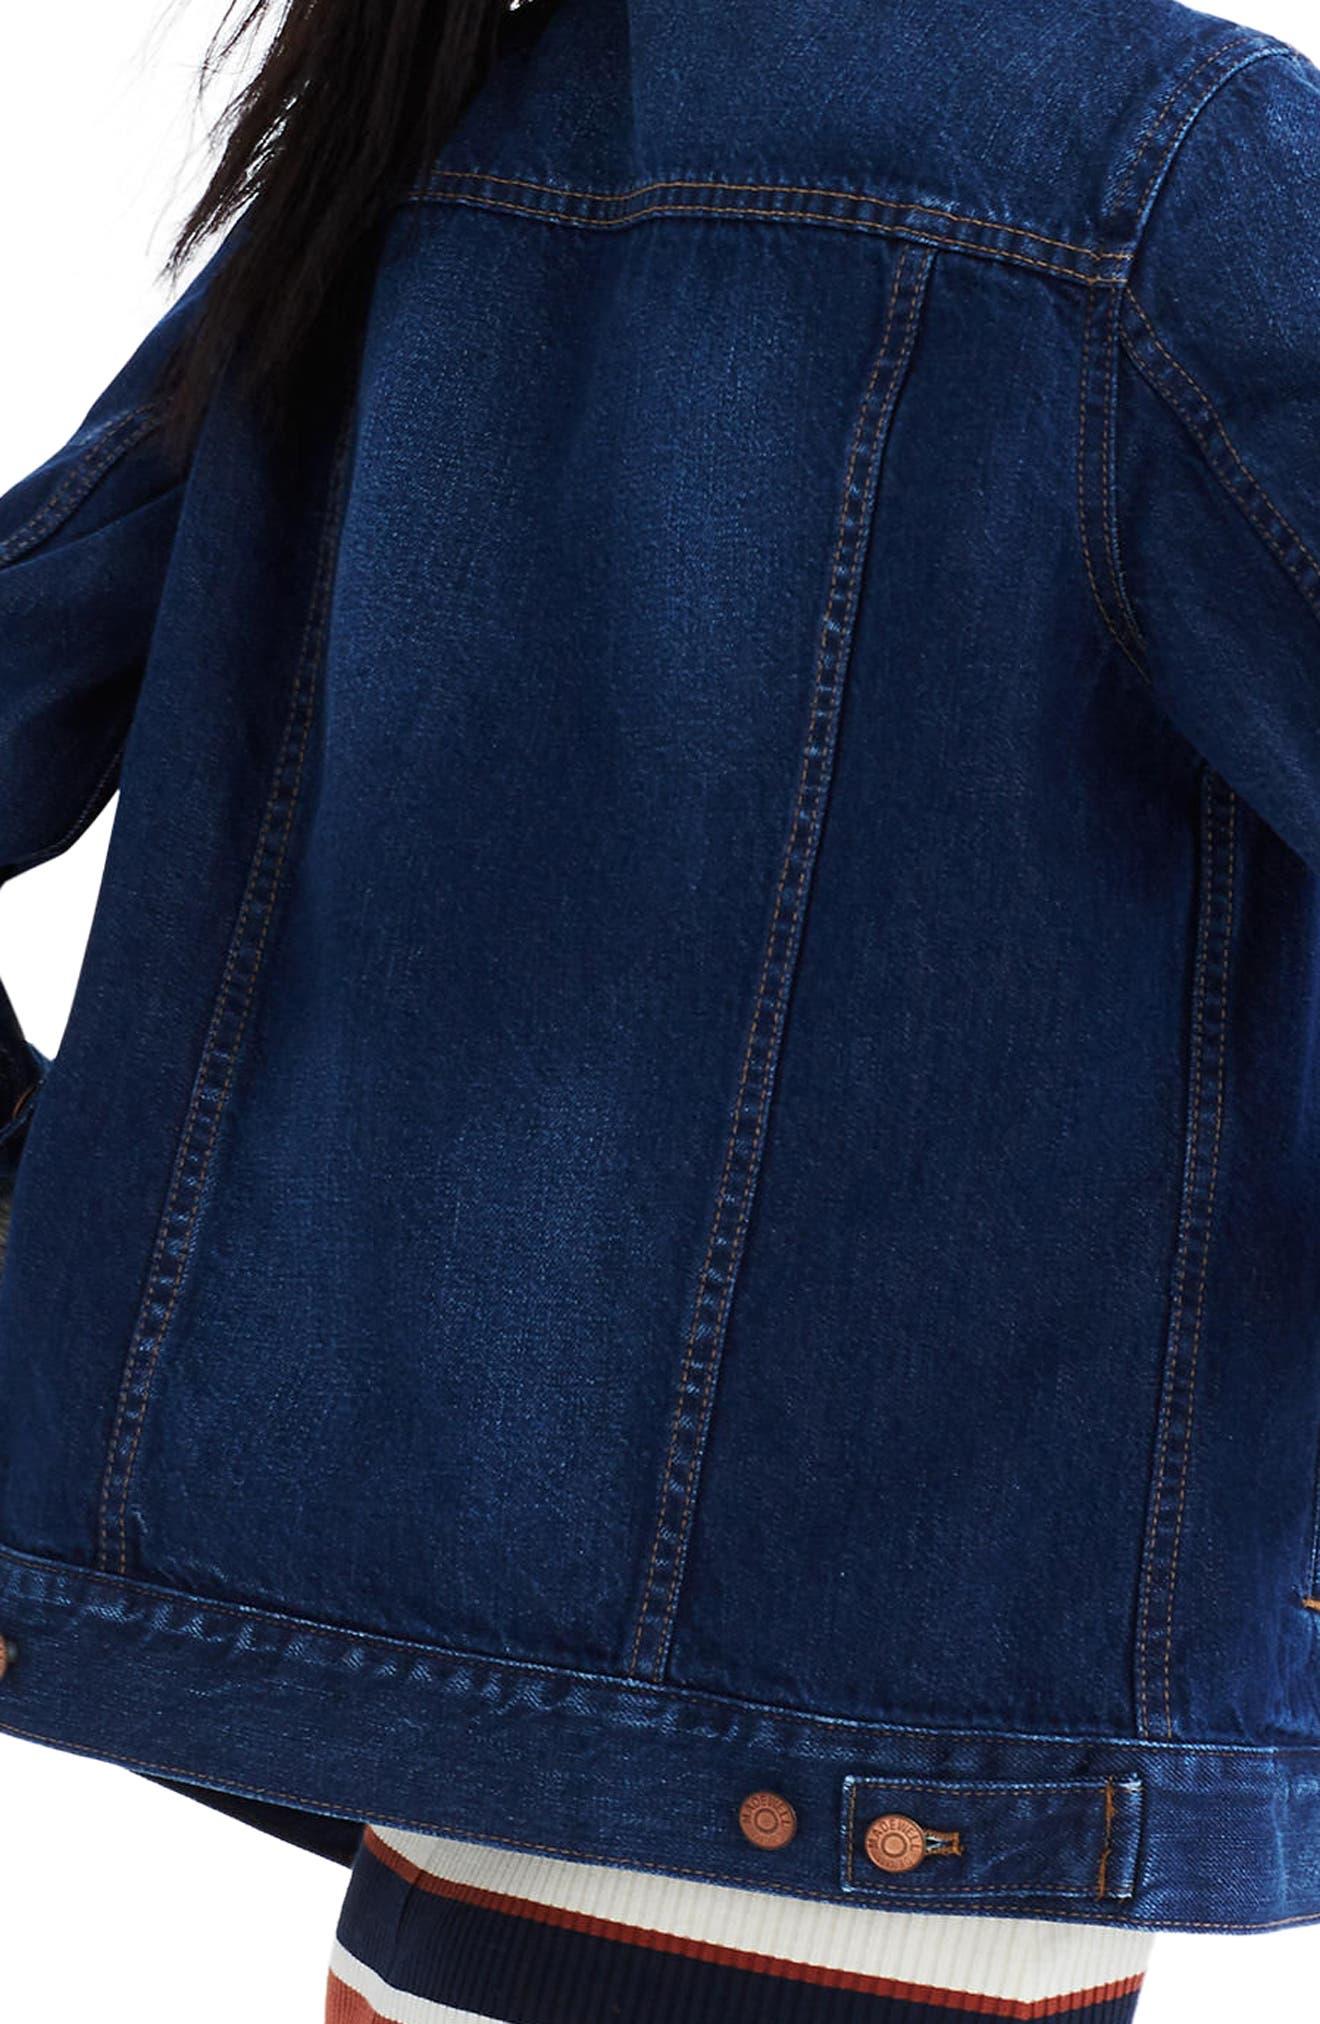 MADEWELL, Denim Jacket, Alternate thumbnail 4, color, BRIARWOOD WASH